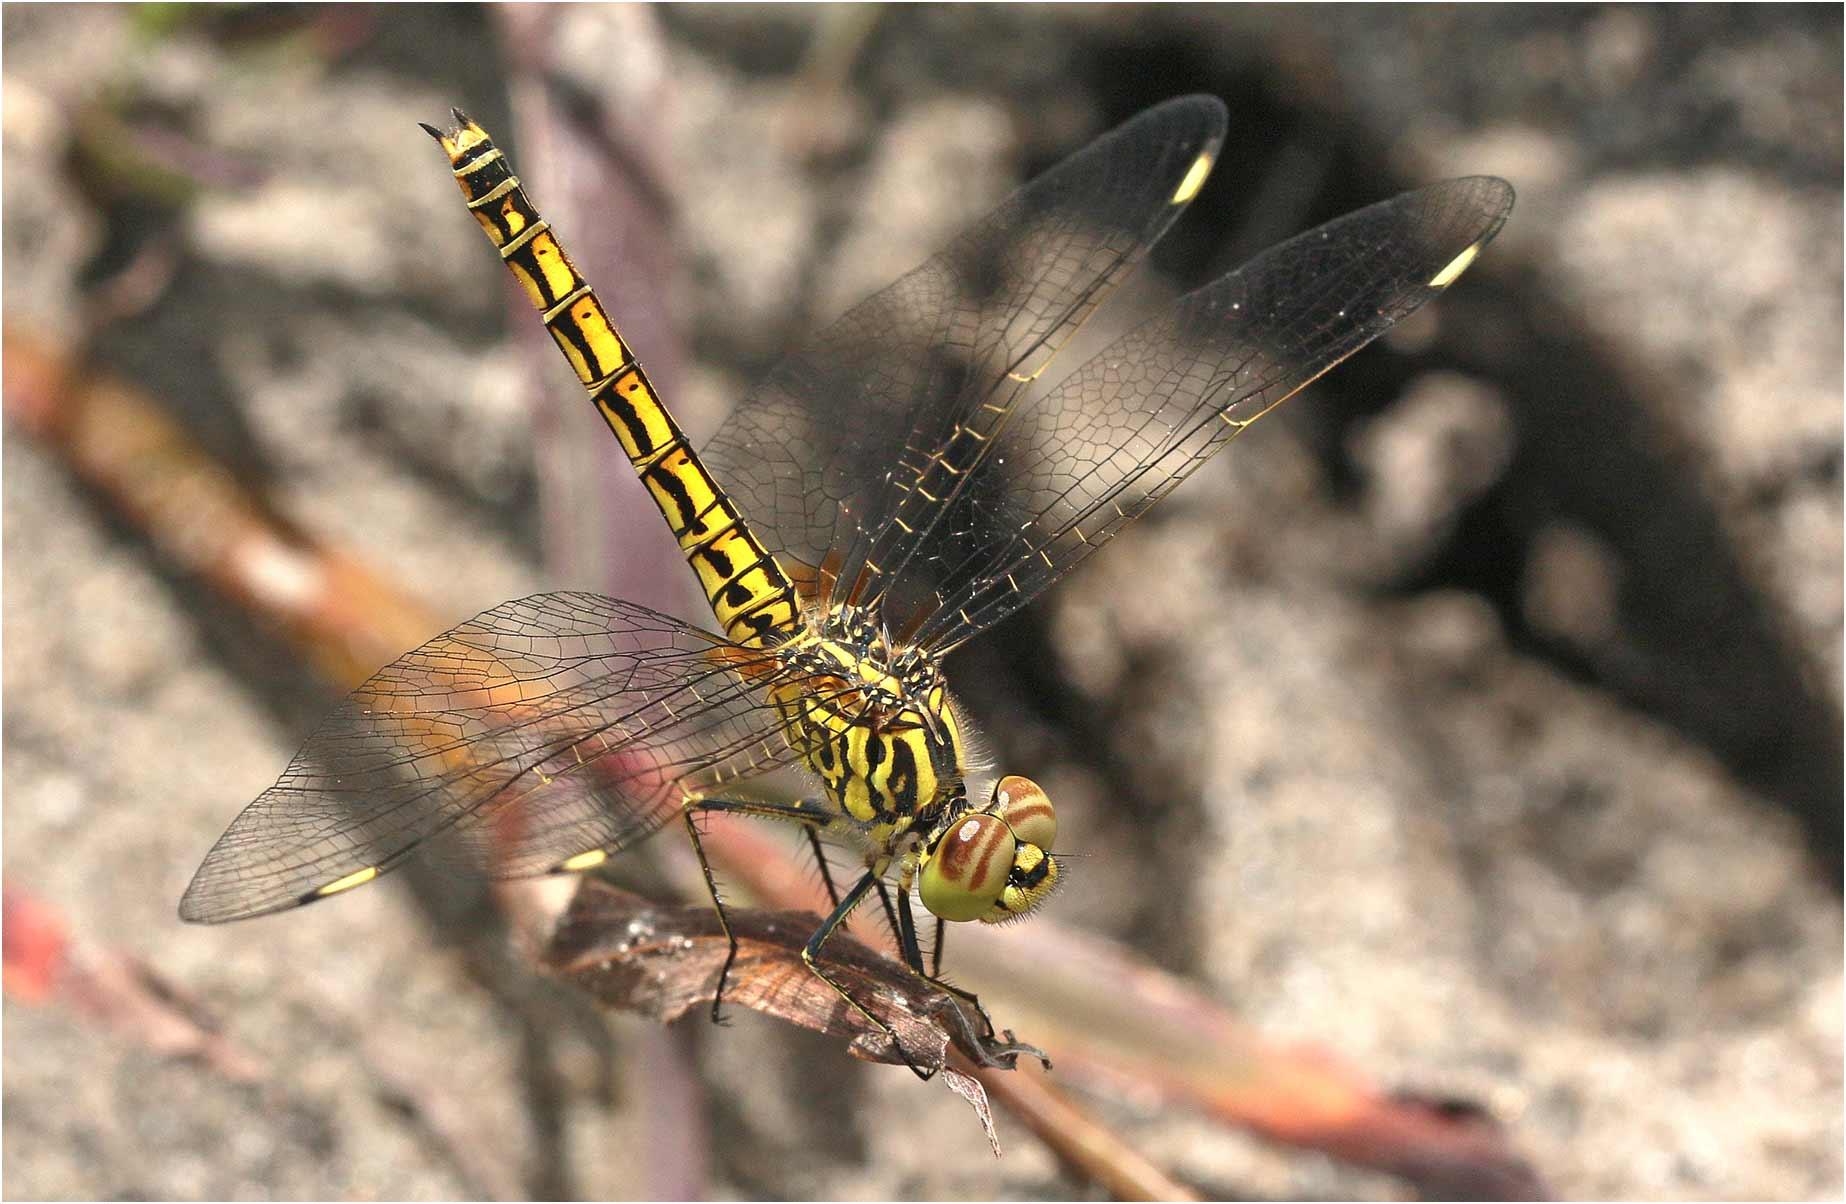 Brachythemis leucosticta femelle, Namibie, parc national de Bwabwata, Bum Hill, 14/02/2020